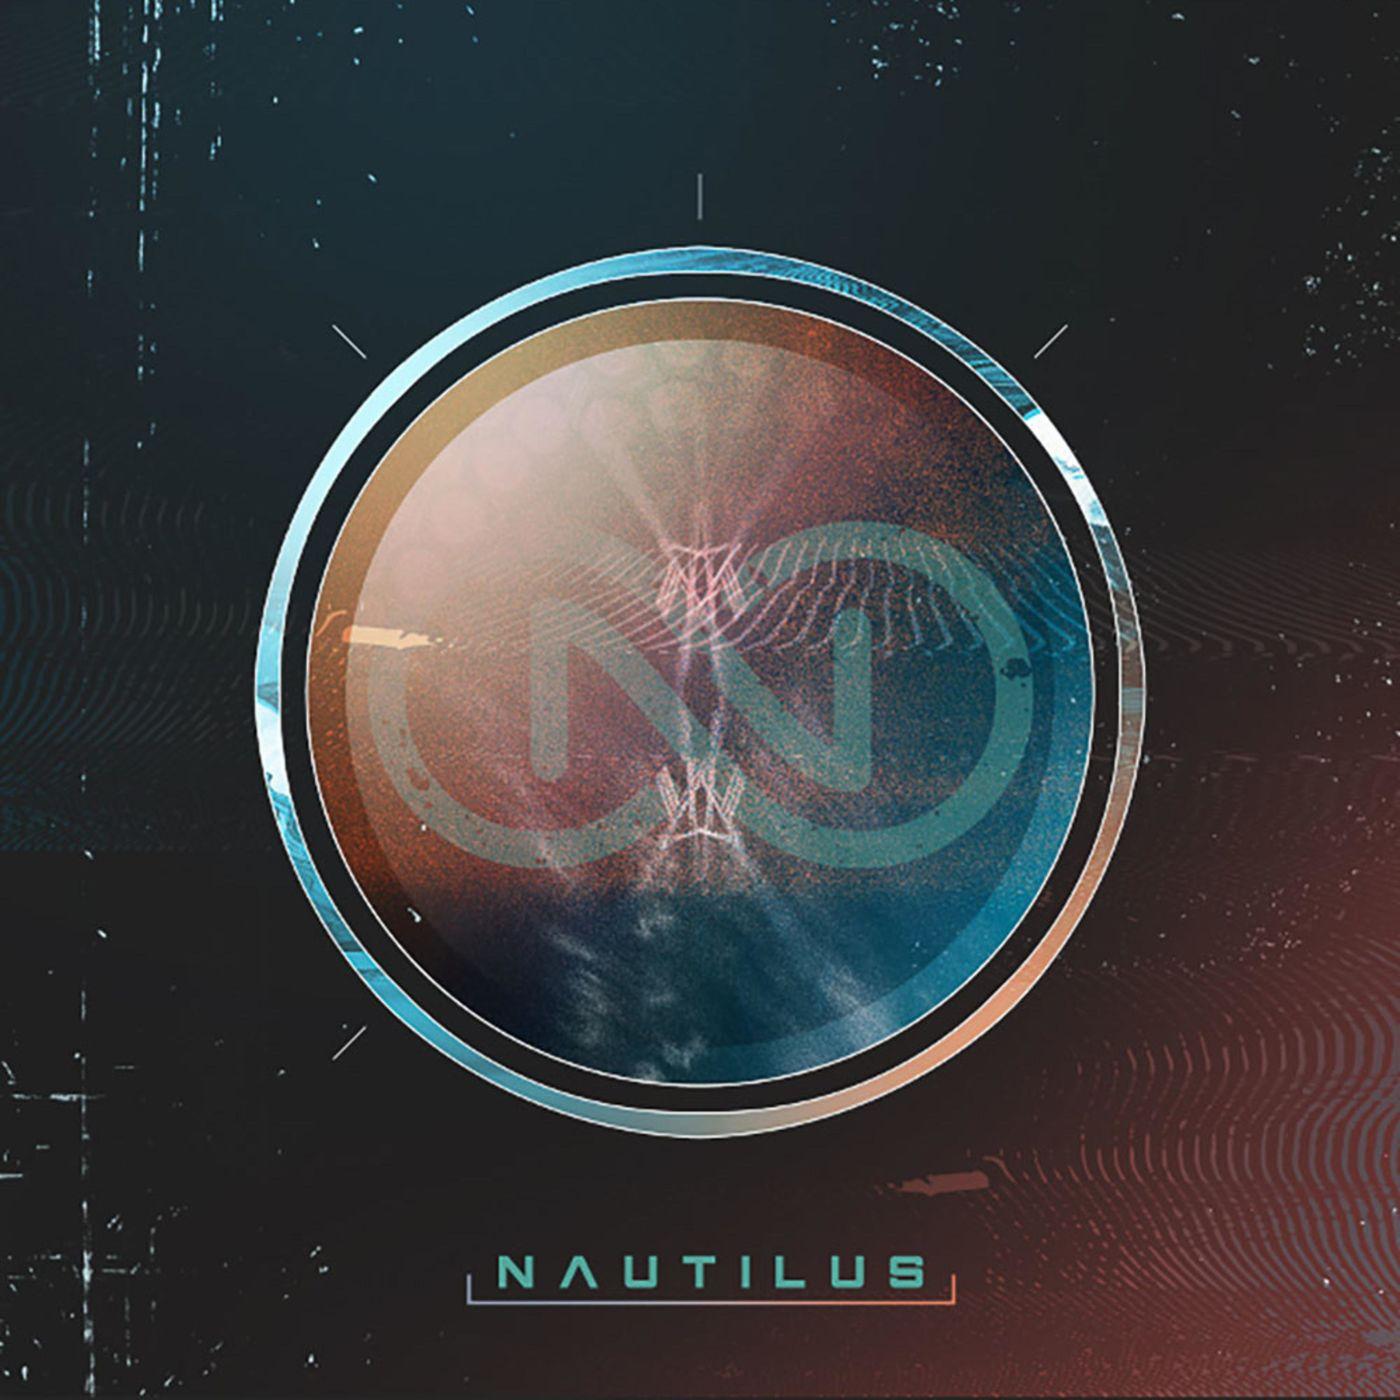 Nautilus - Nautilus [EP] (2019)